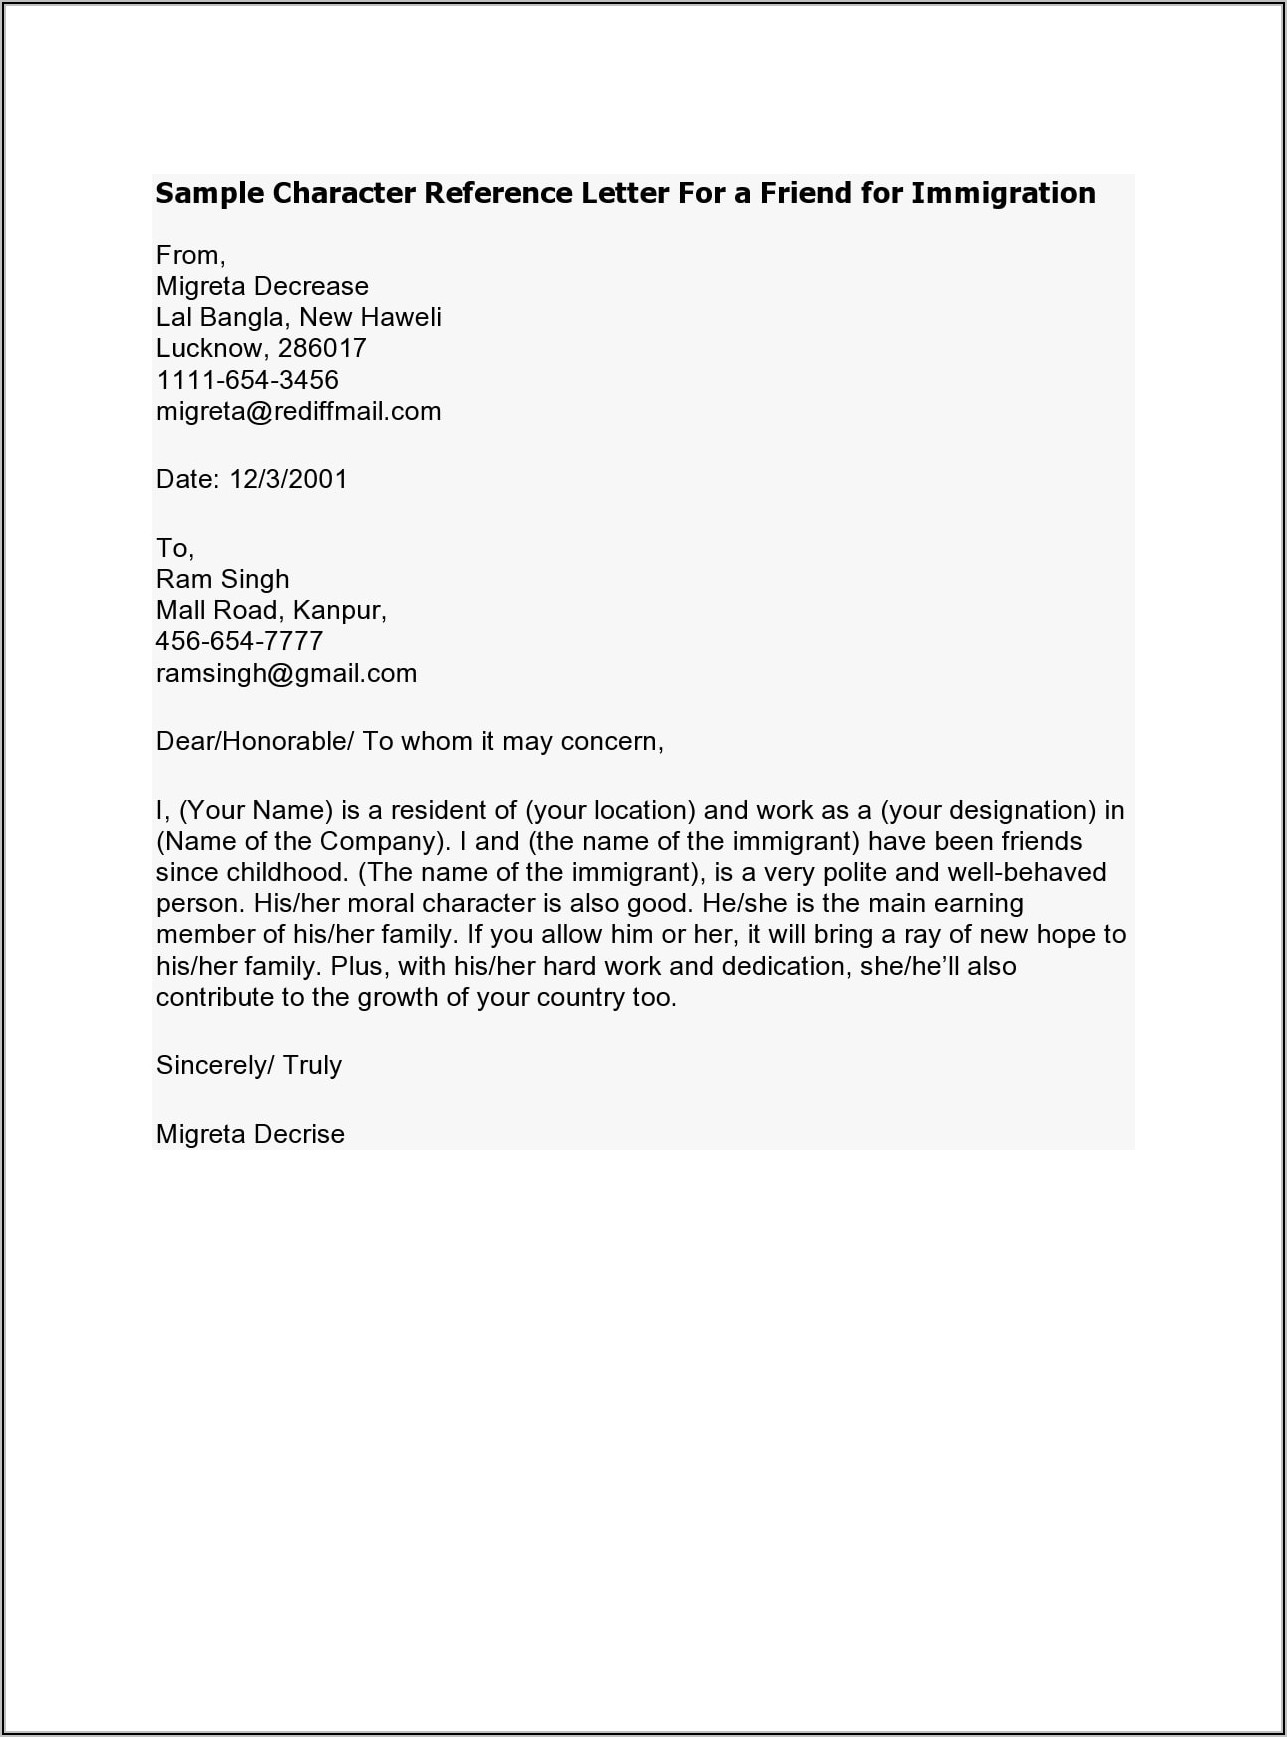 Family Member Good Moral Character Letter For Immigration Sample